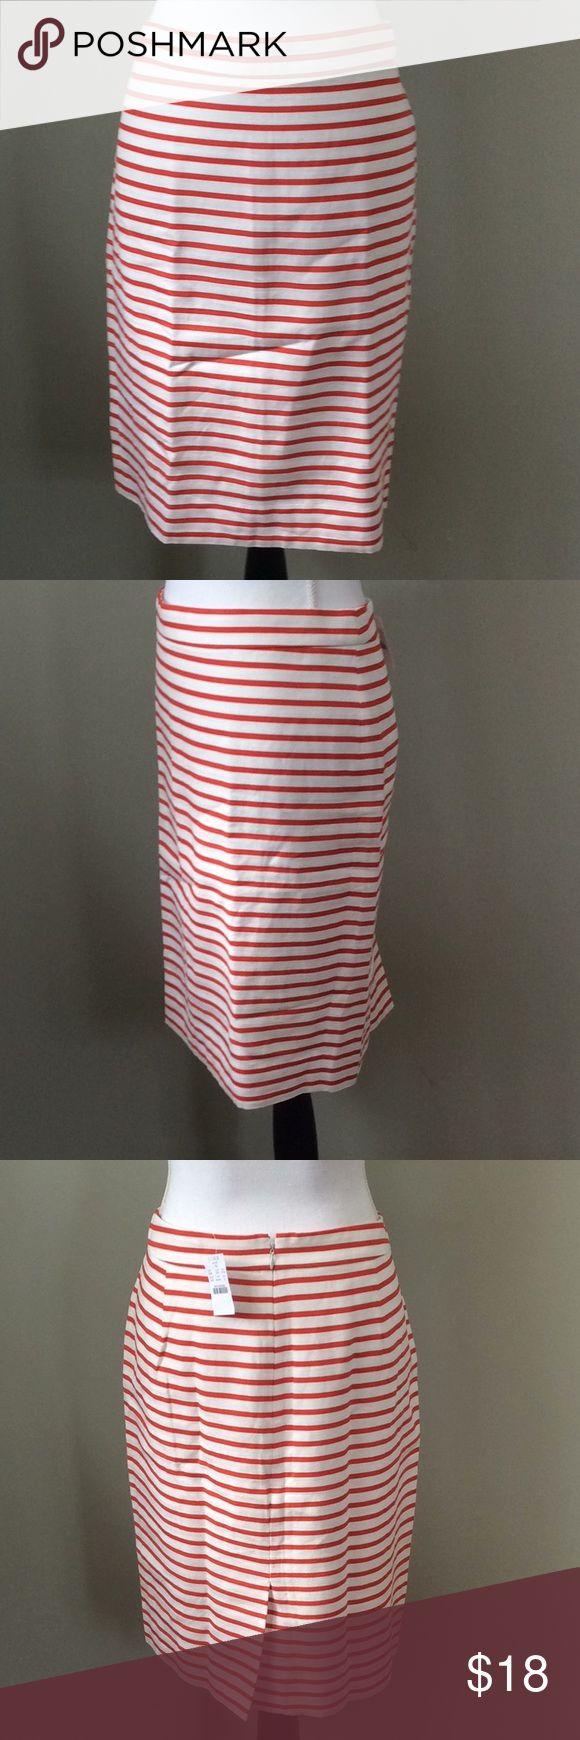 "Orange Striped ""The Pencil Skirt"" Size 12 J. Crew Factory ""The Pencil Skirt"" Orange White Striped Size 12 New Cotton Linen Blend Waist-18.5"" Length-22.5"" J. Crew Factory Skirts Pencil"